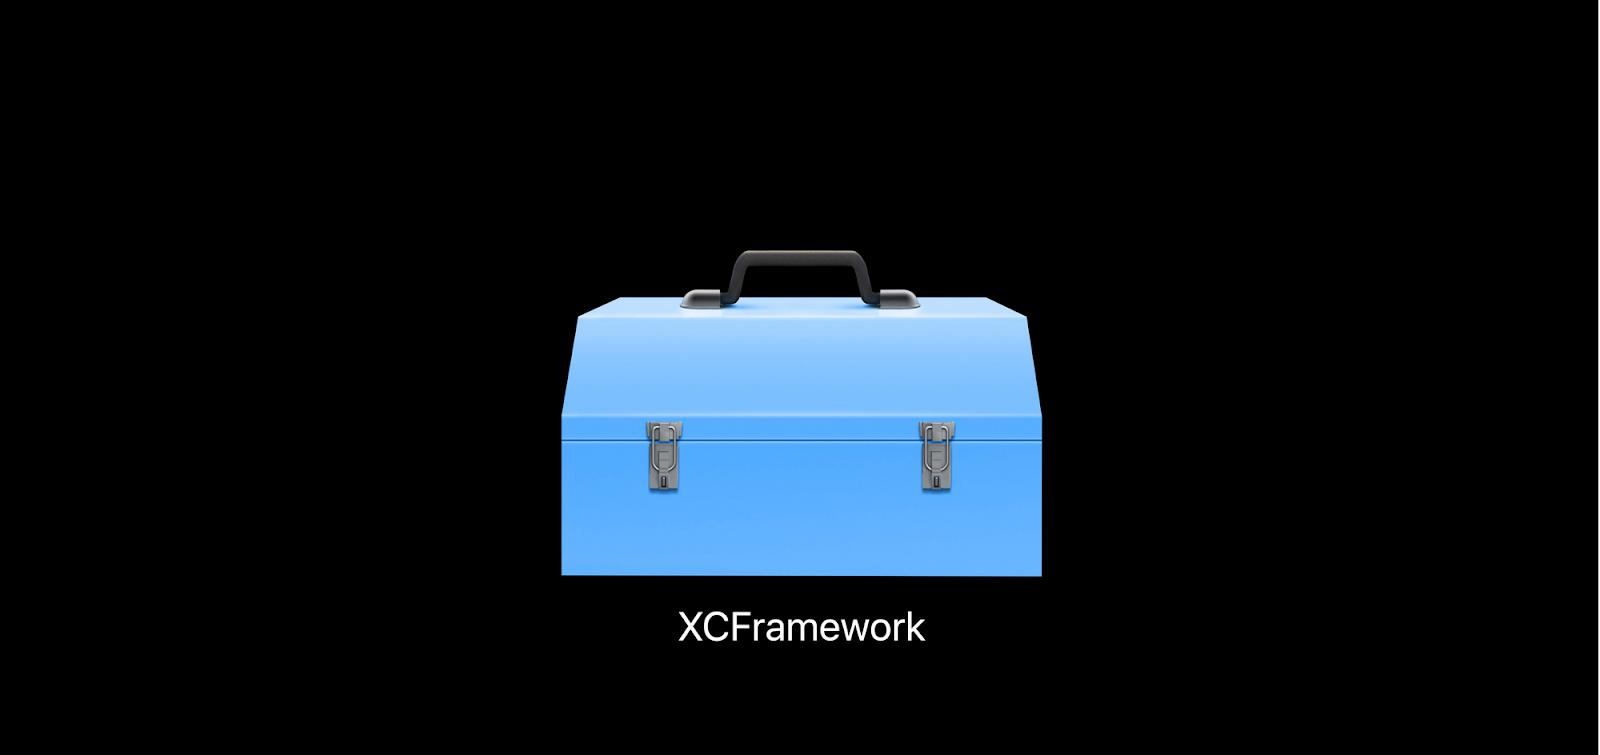 XCFramework logo